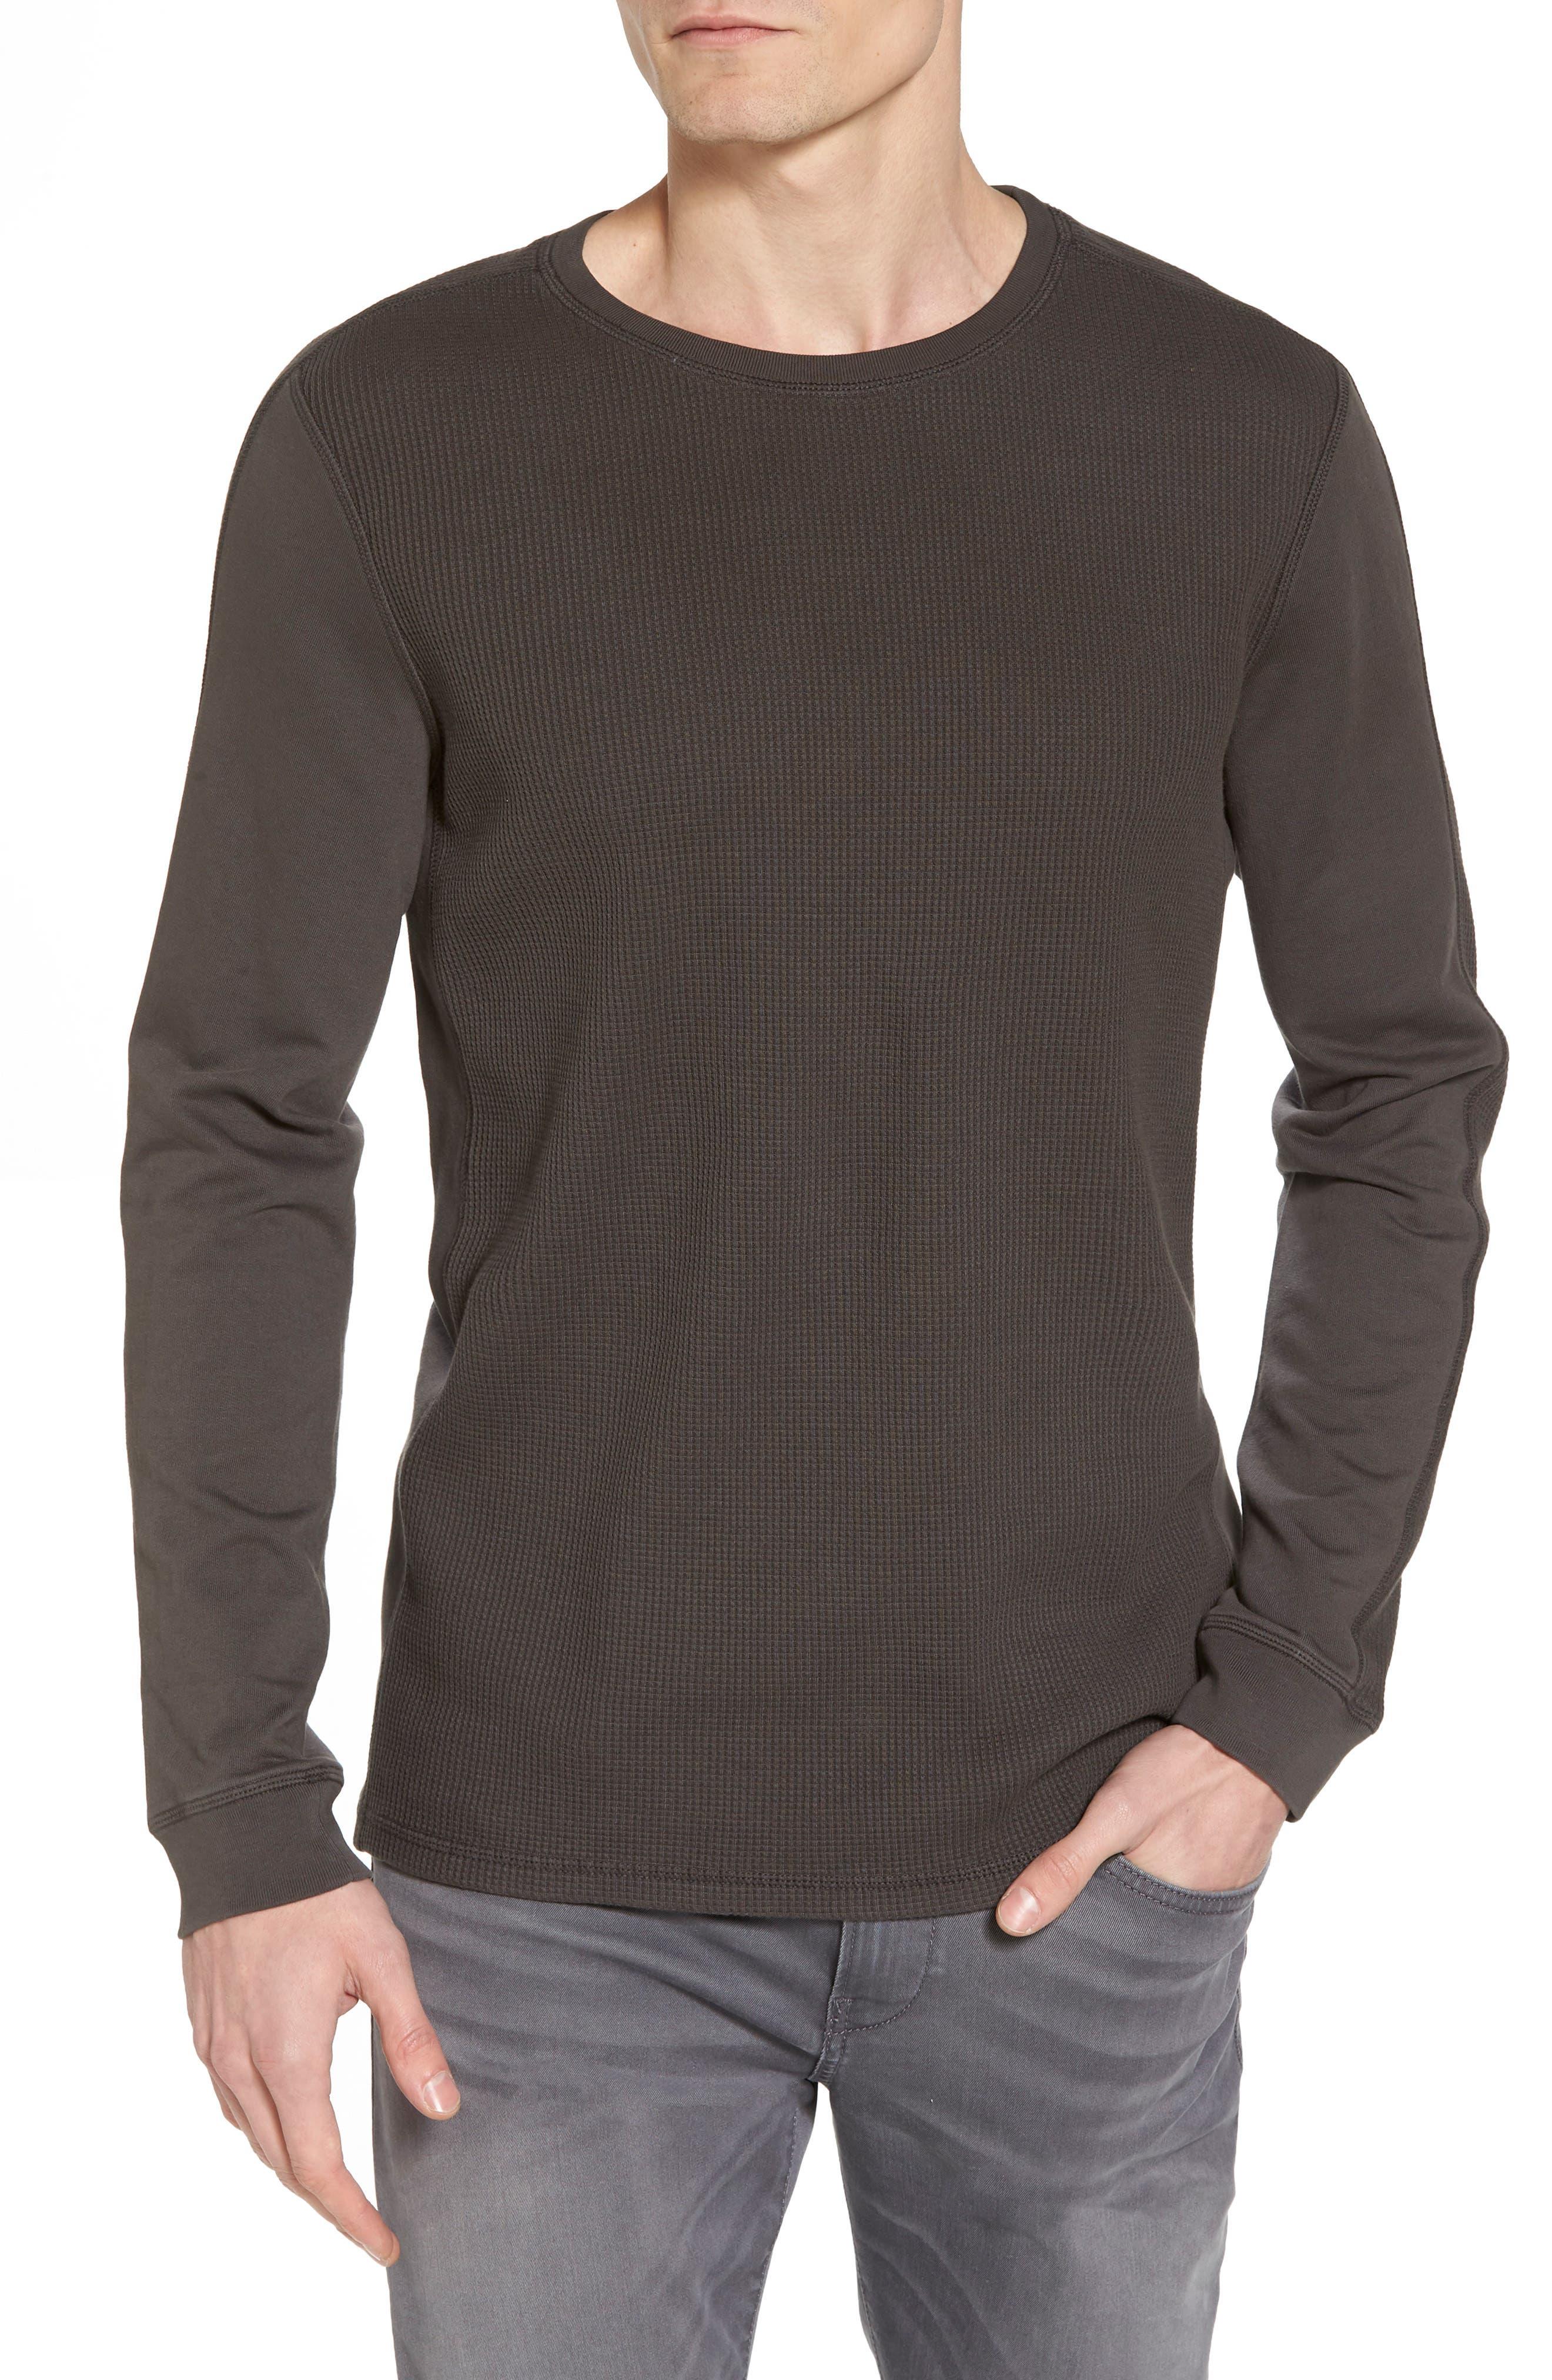 Trevor Slim Fit Crewneck Shirt,                         Main,                         color, 032